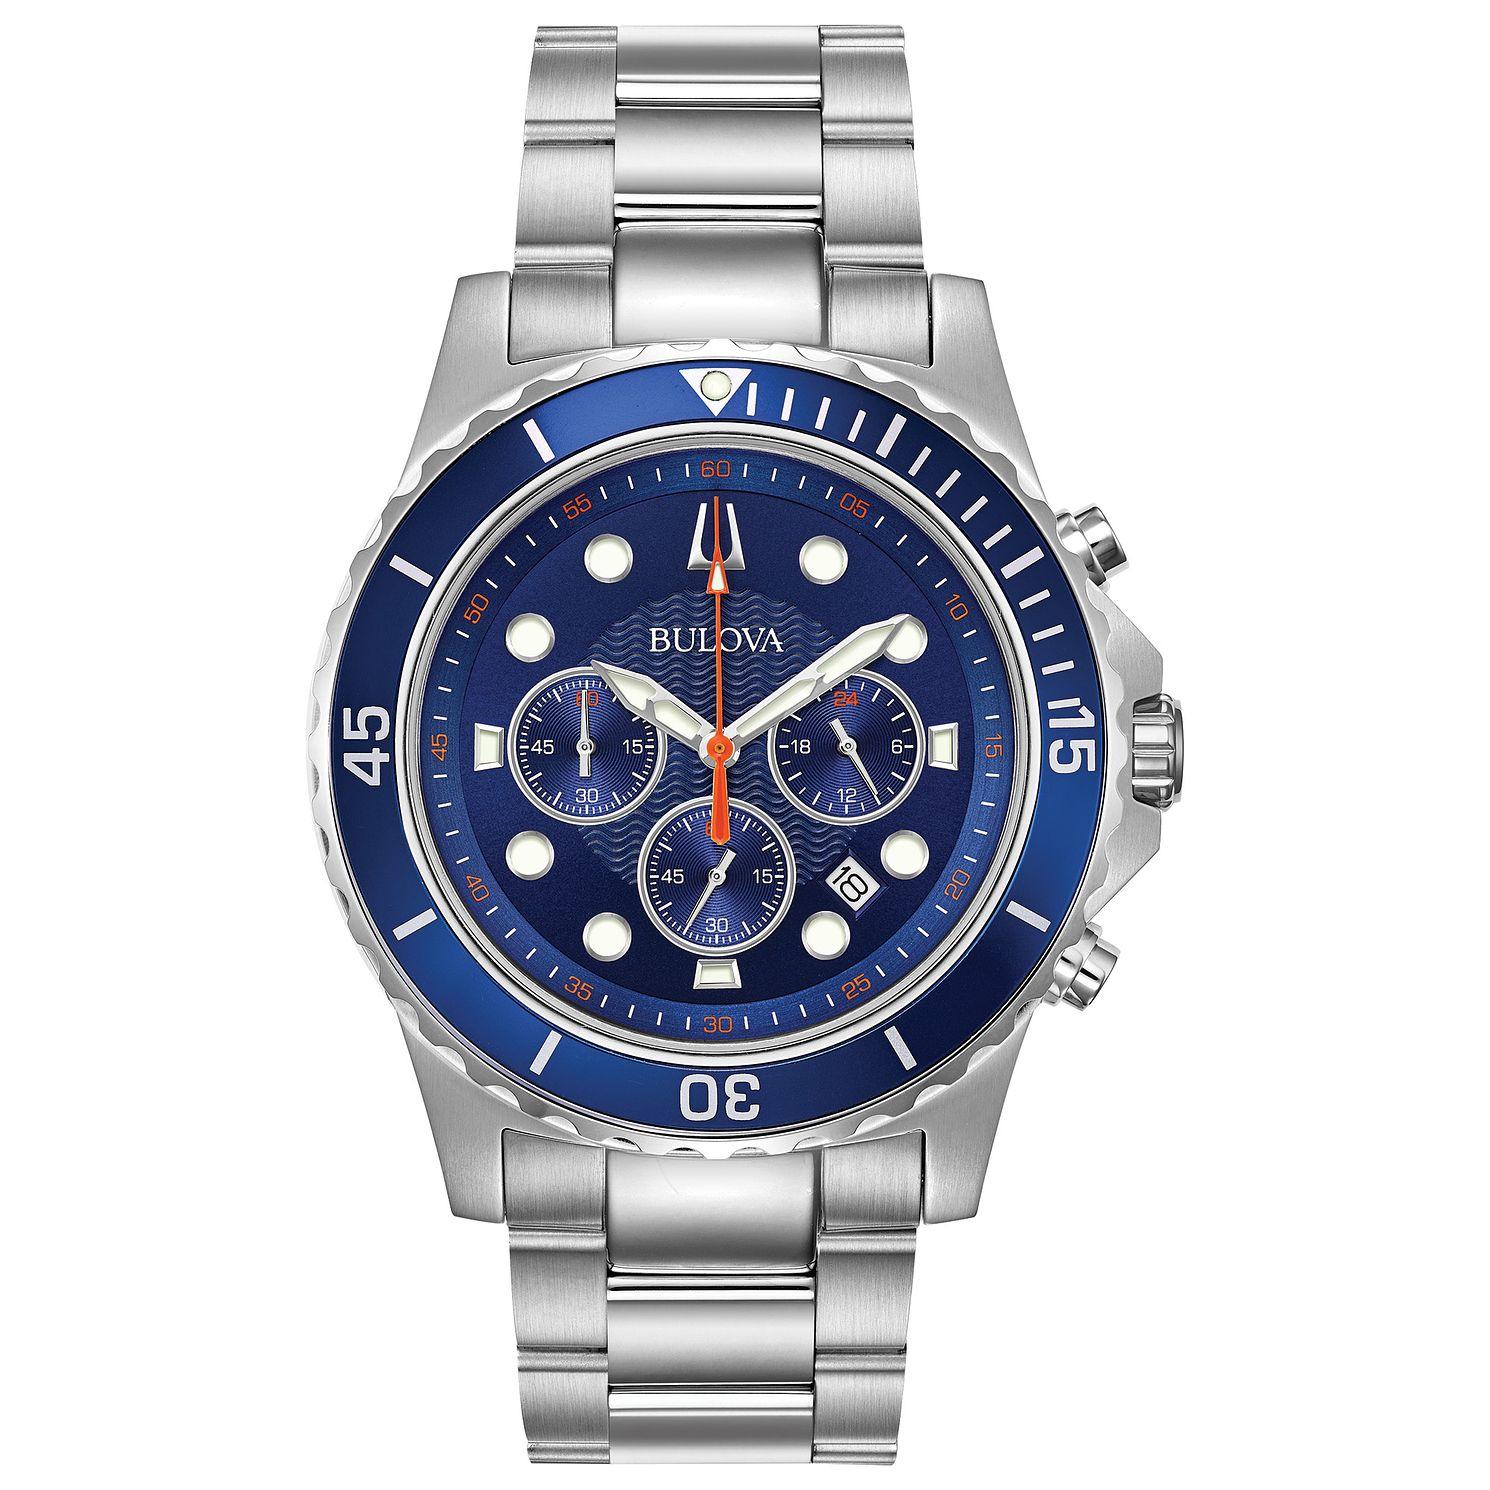 Bulova Men's Classic Blue Dial Bracelet Watch £99.99 at H.Samuel